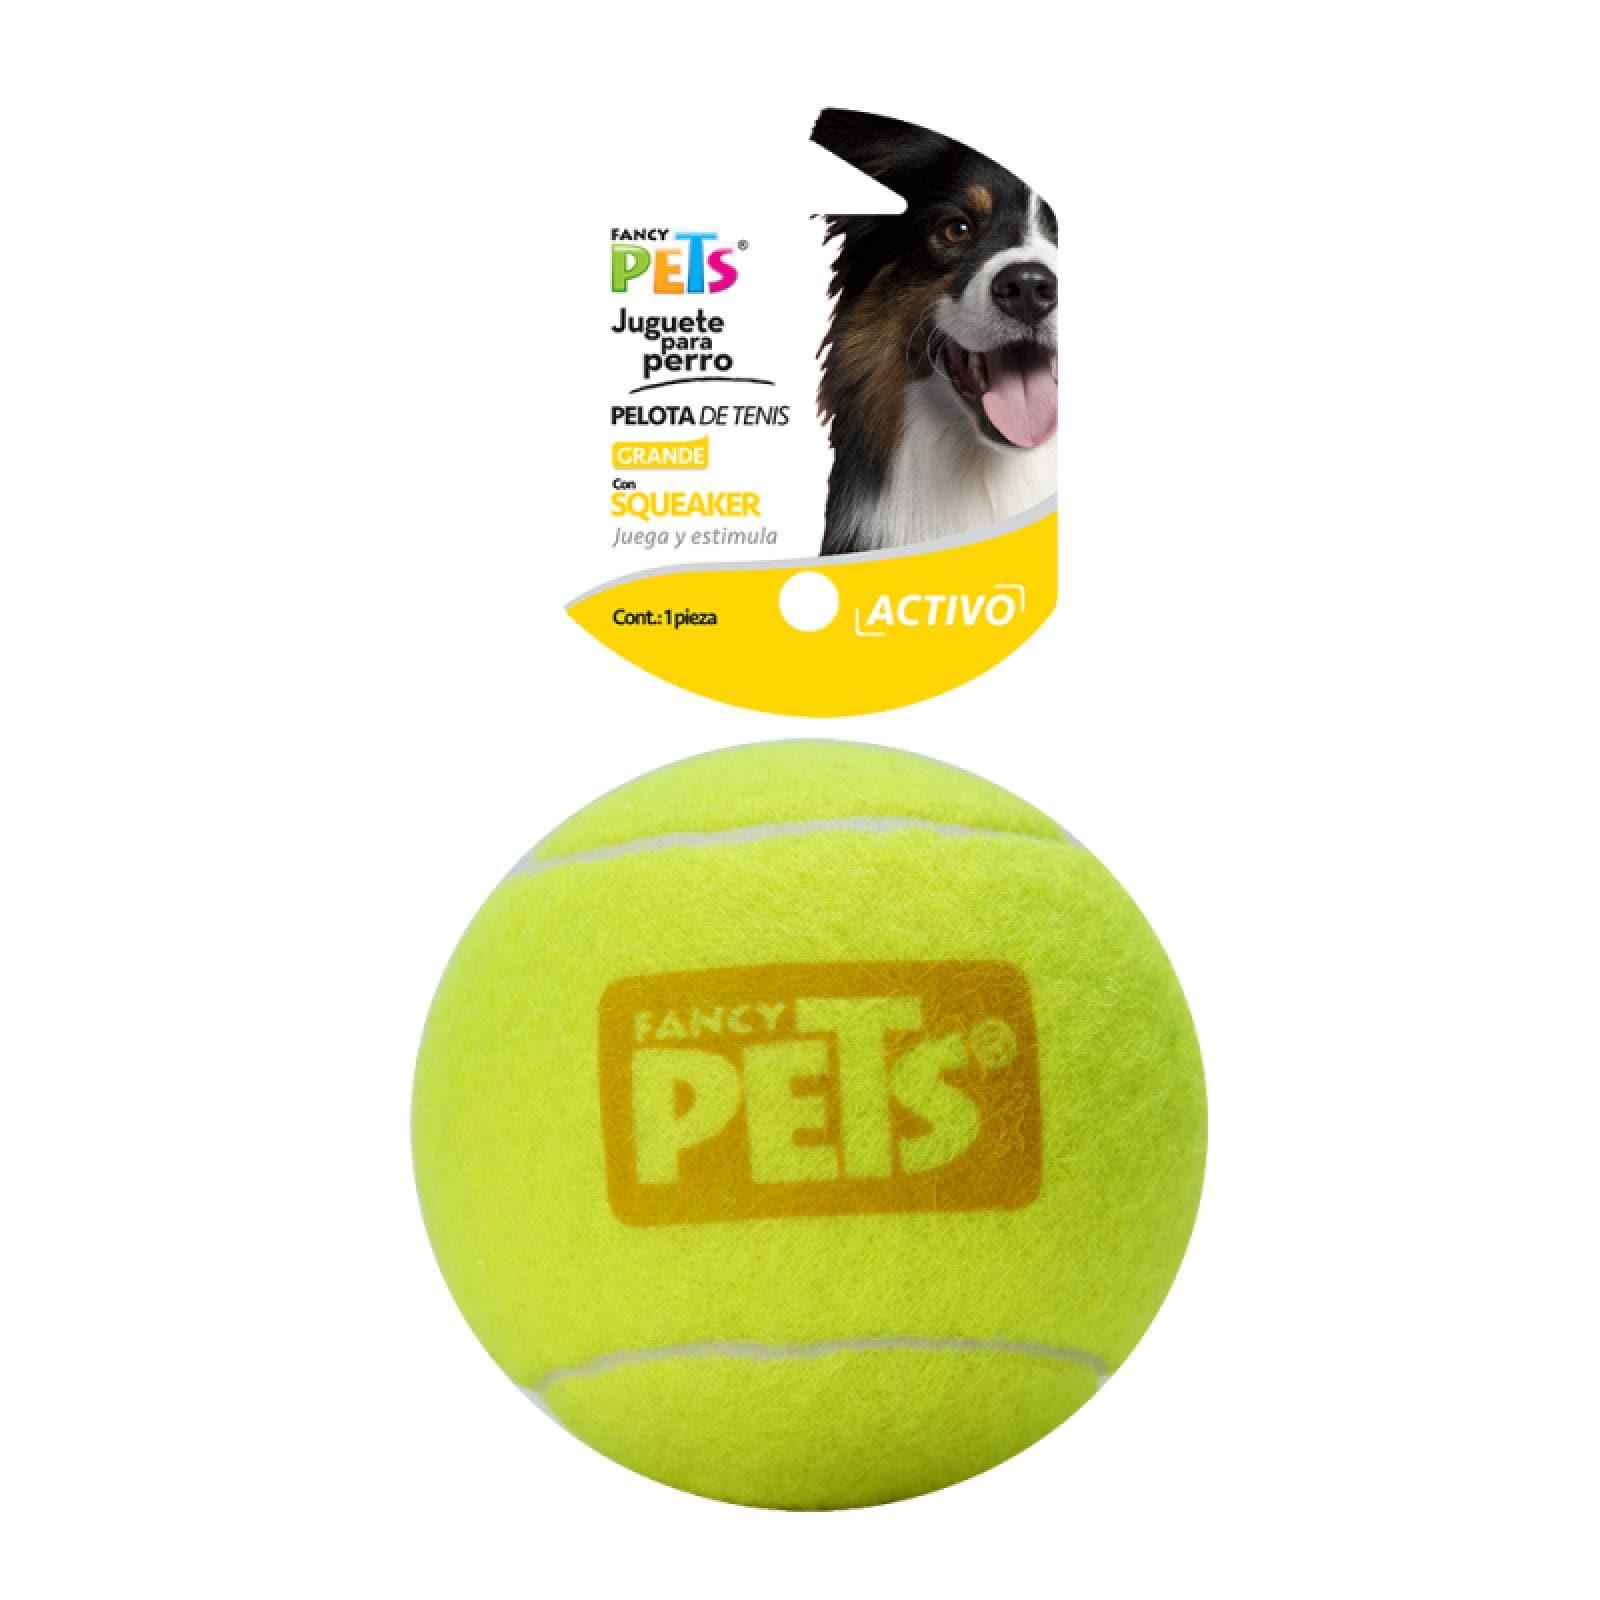 Pelota Grande Tenis Sonido Squeaker Juguete Perro Fancy Pets